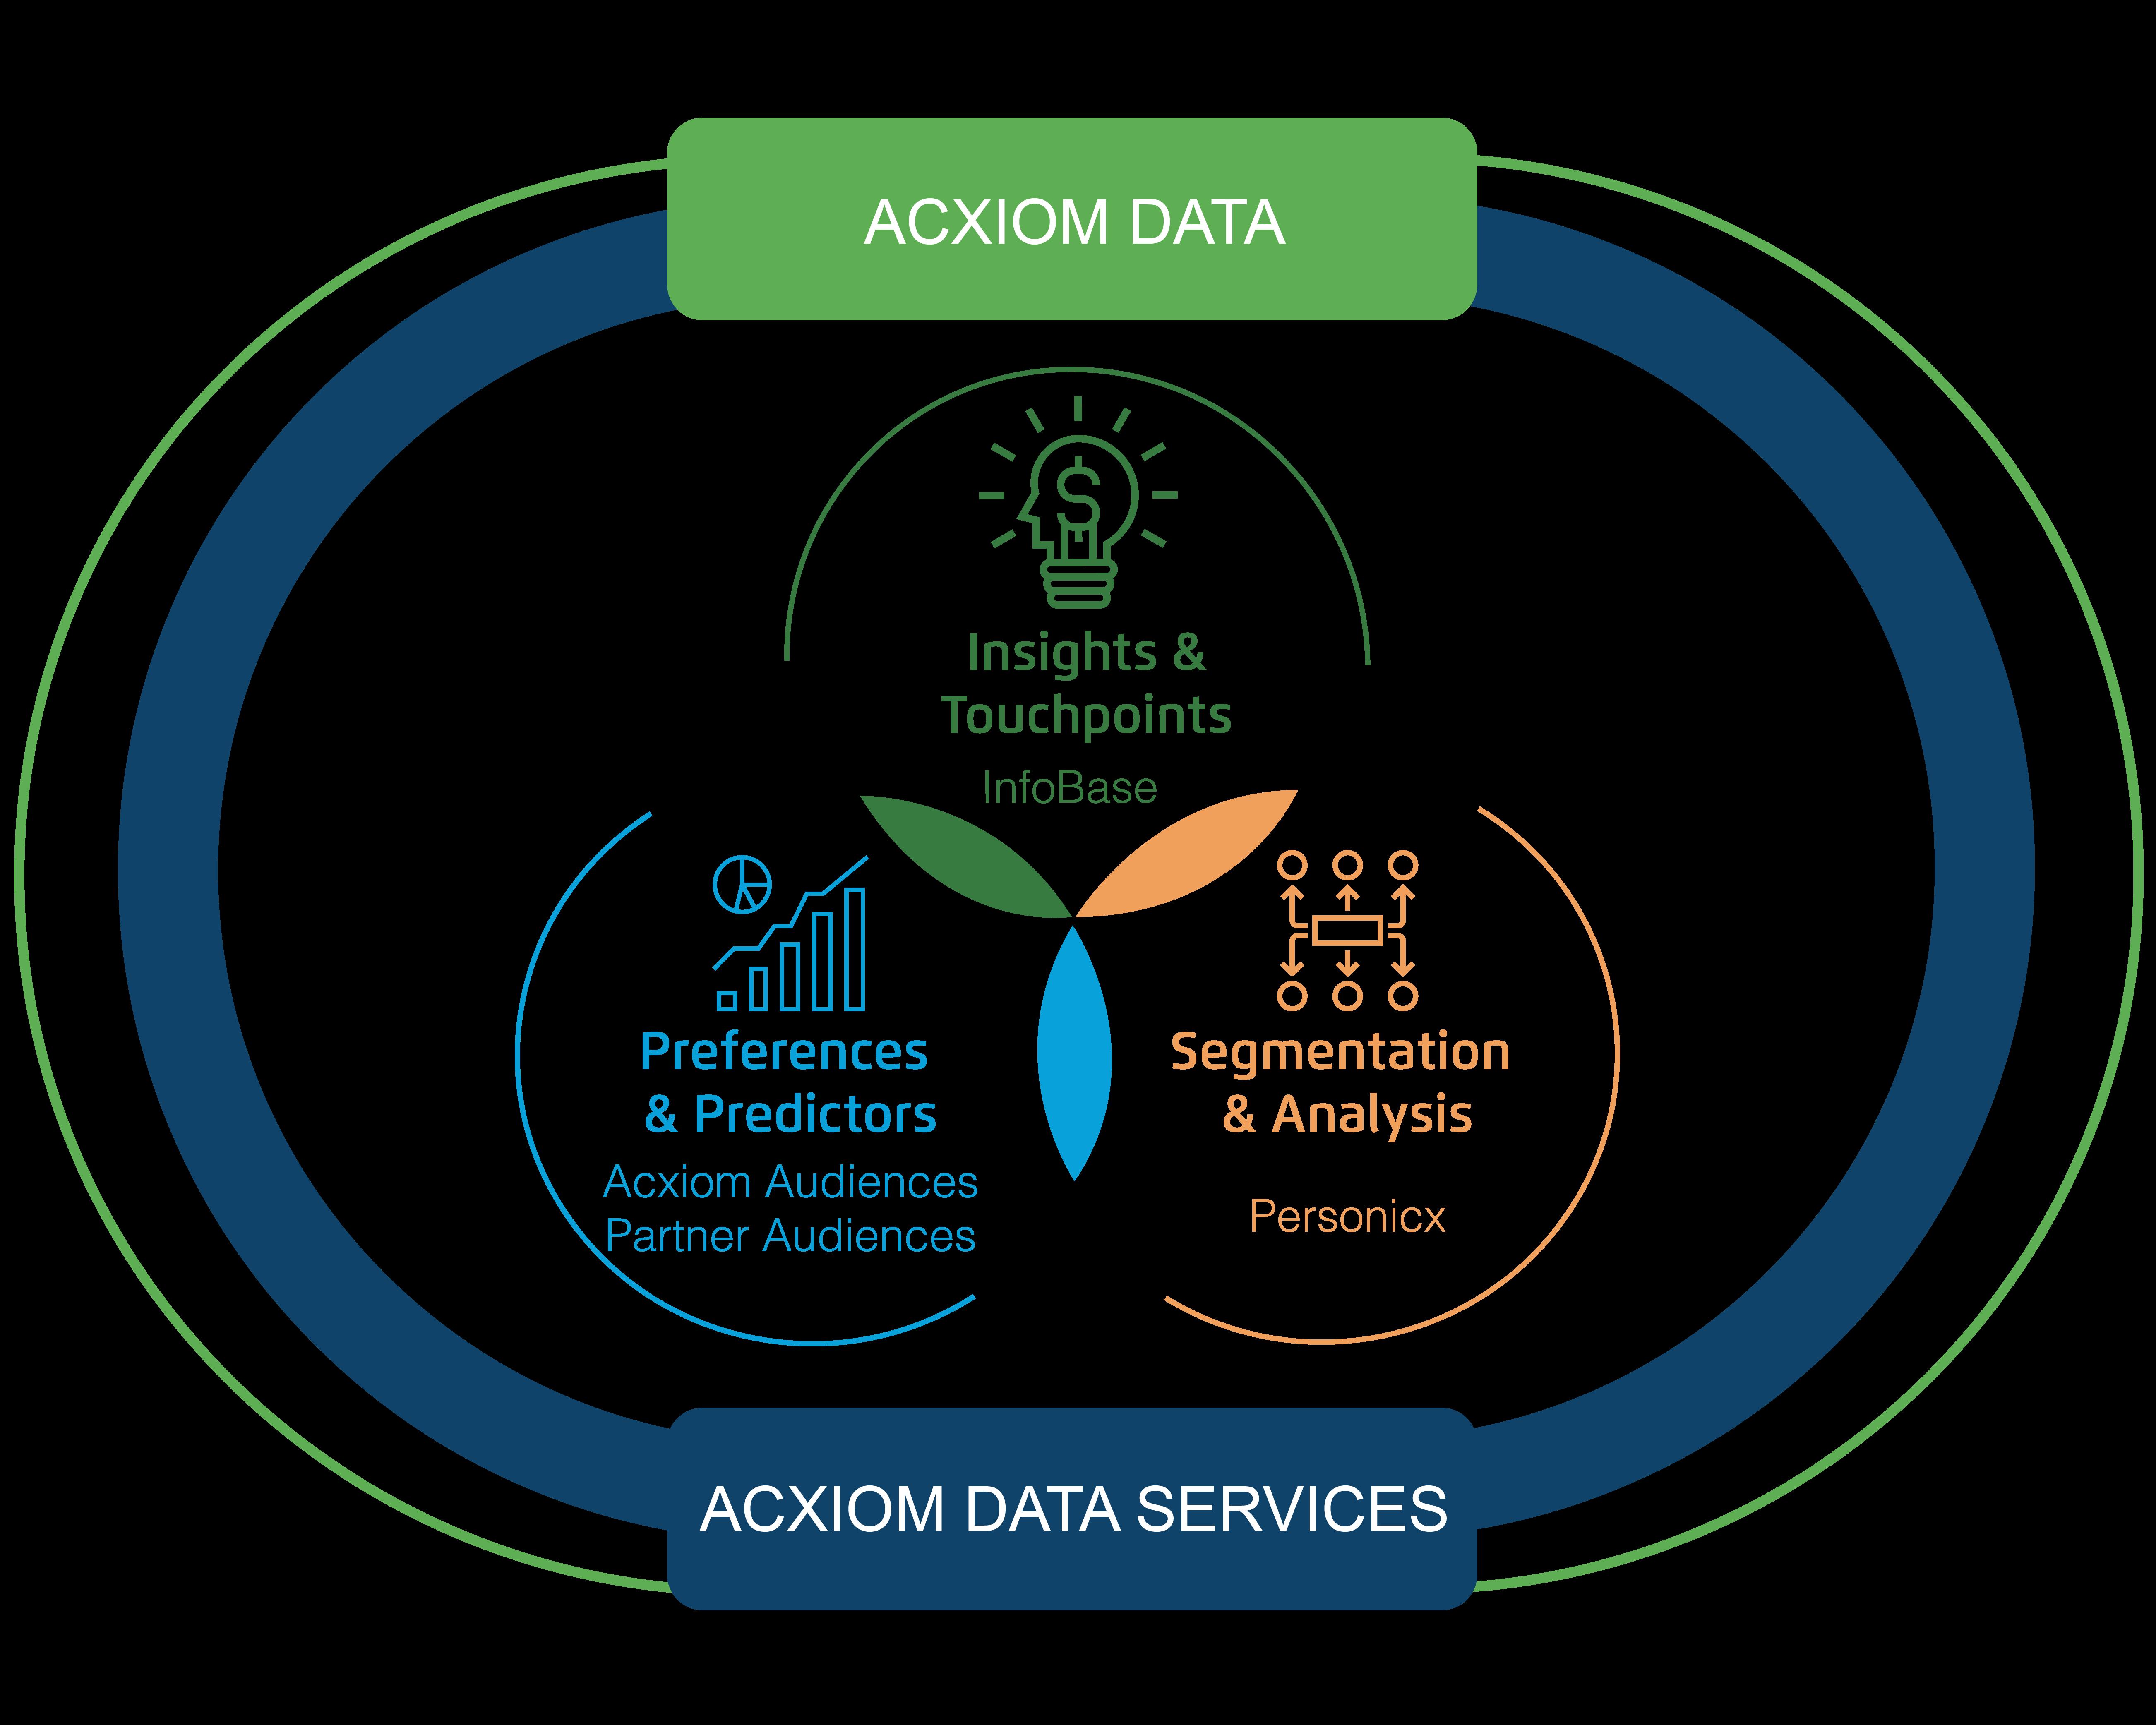 Global Data Offerings